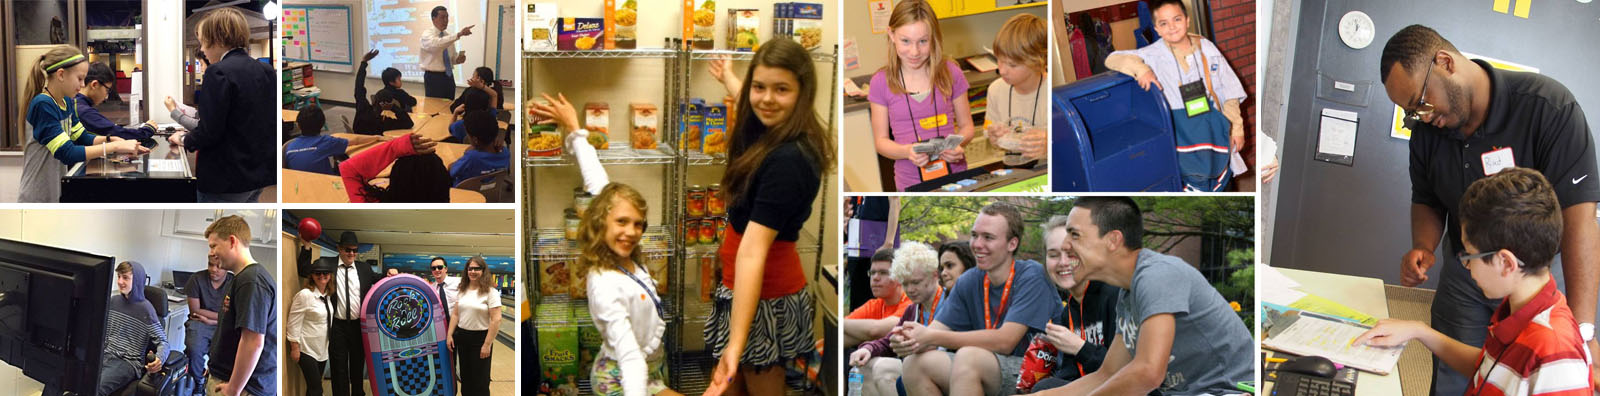 20 Days of Giveaways Day 15: Junior Achievement Upper Midwest